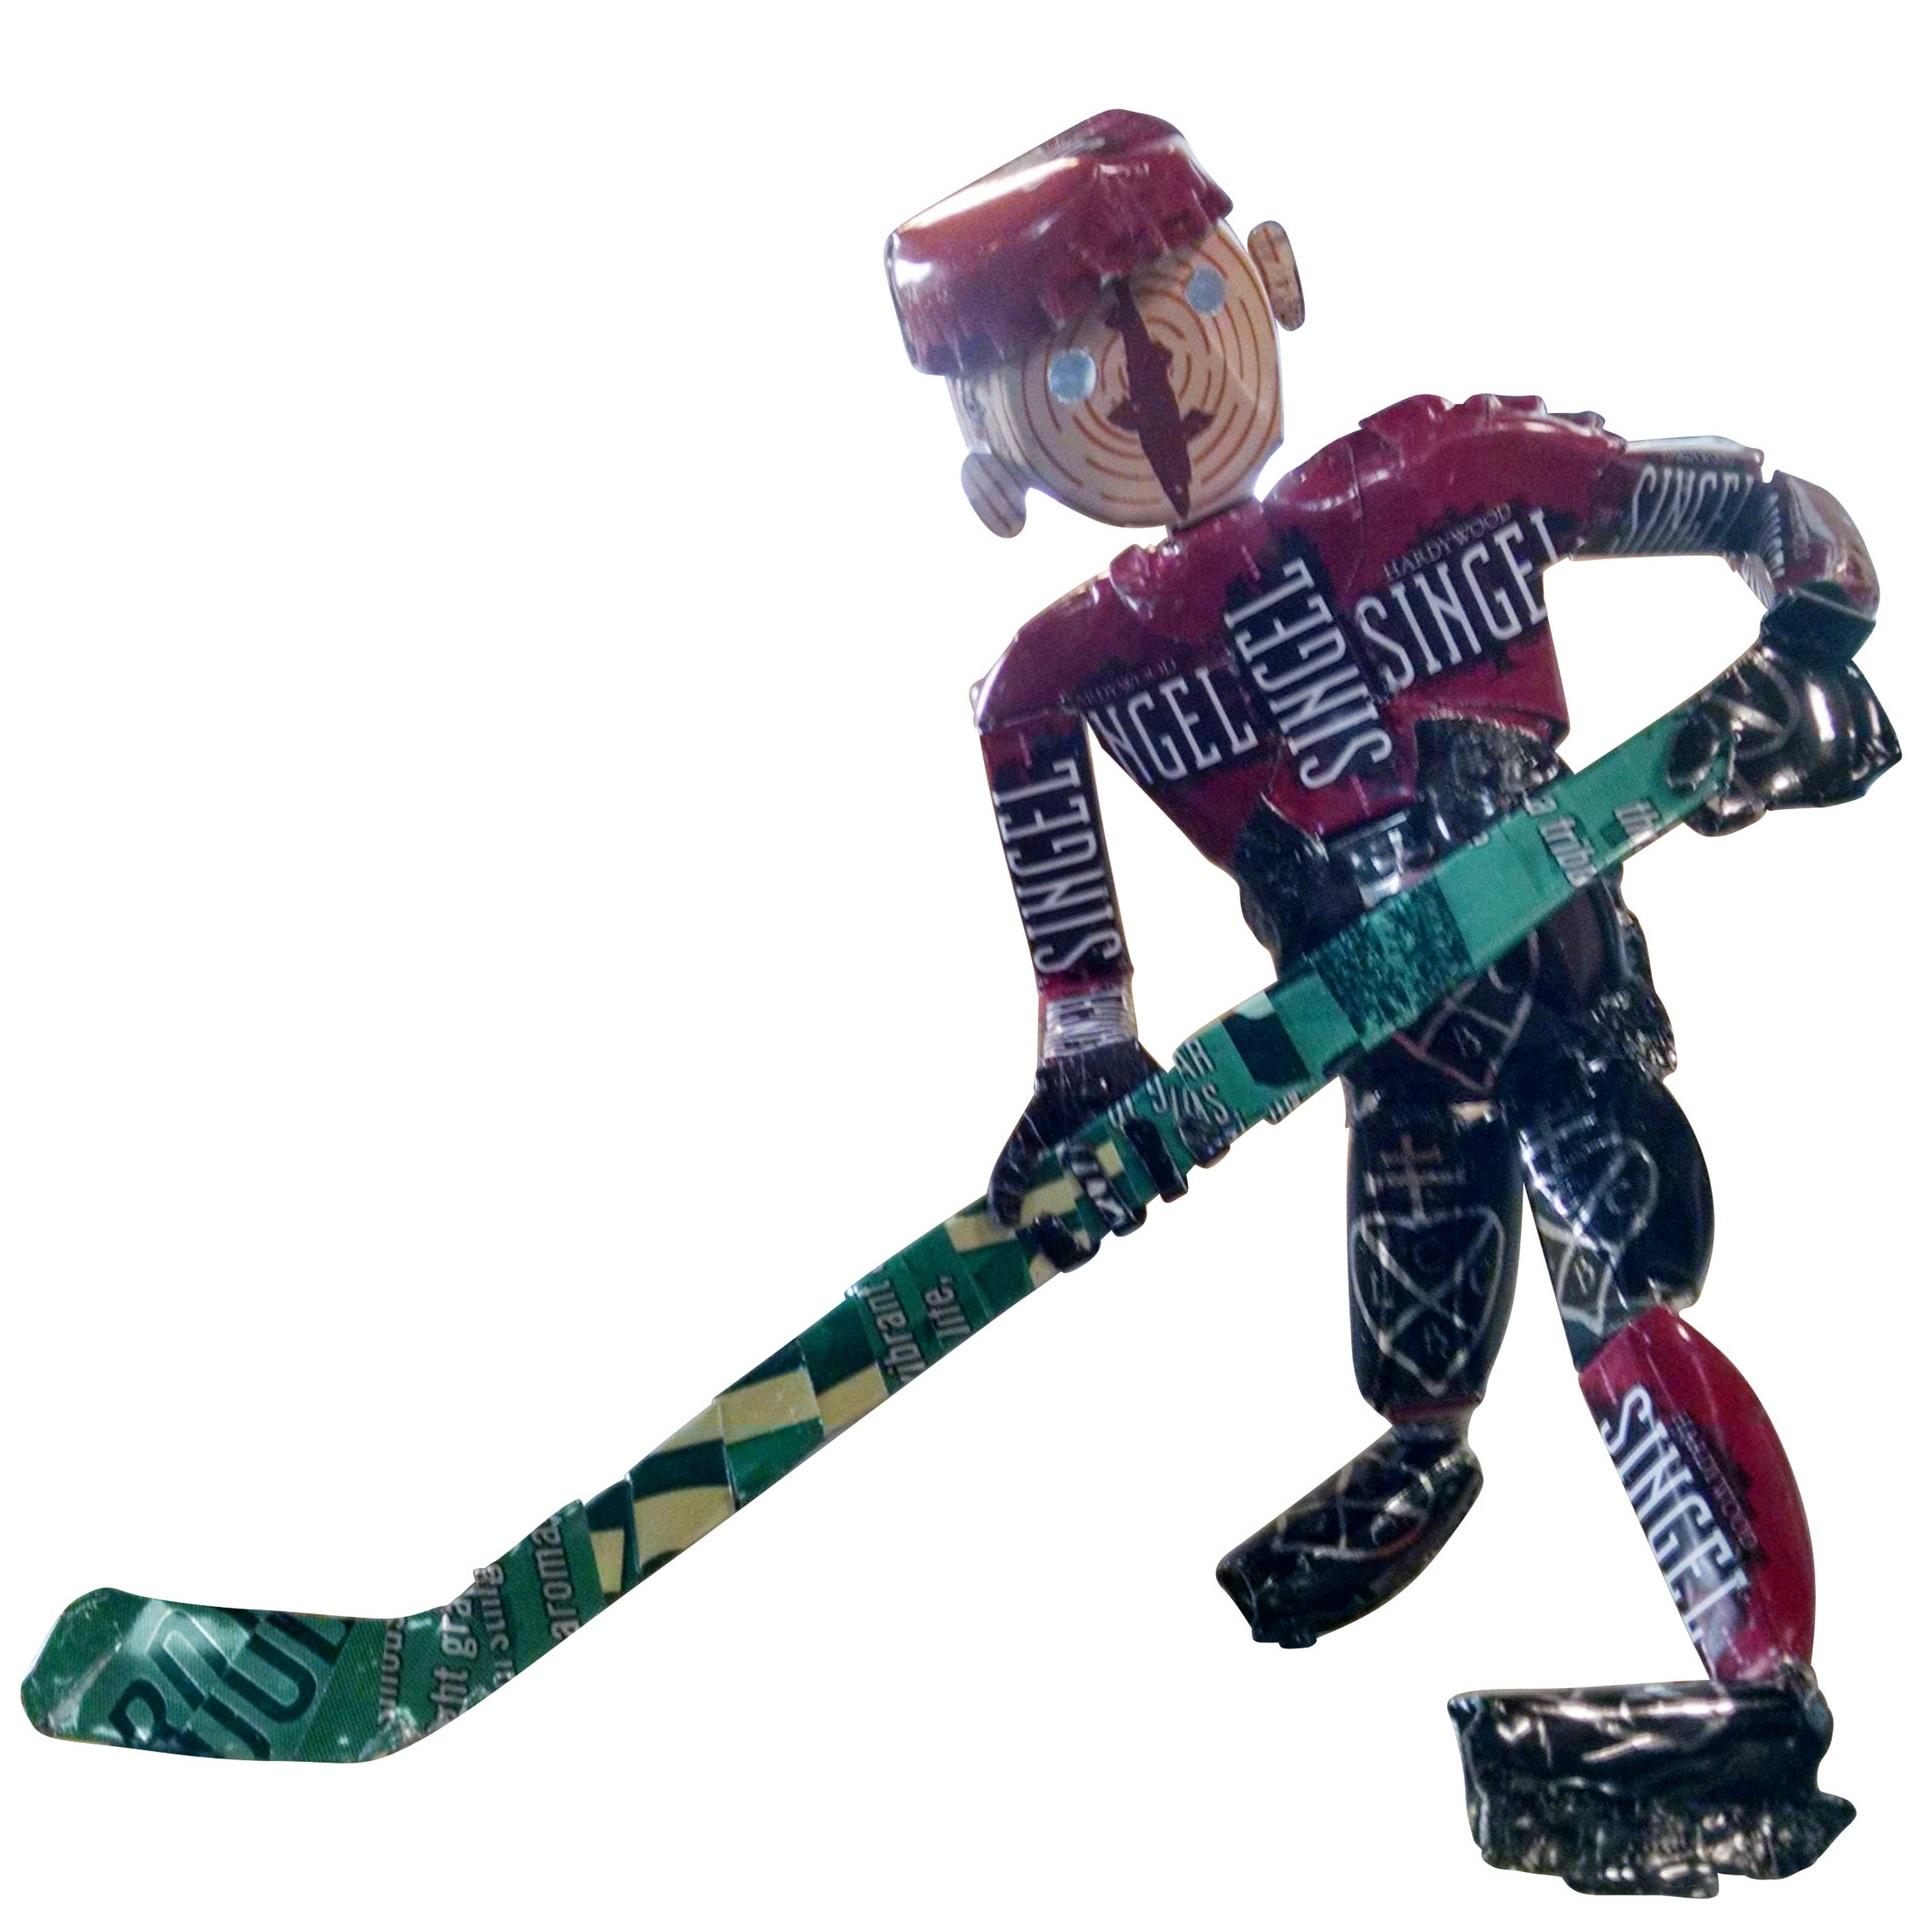 Hockey Player #2 front 1 copy.jpg